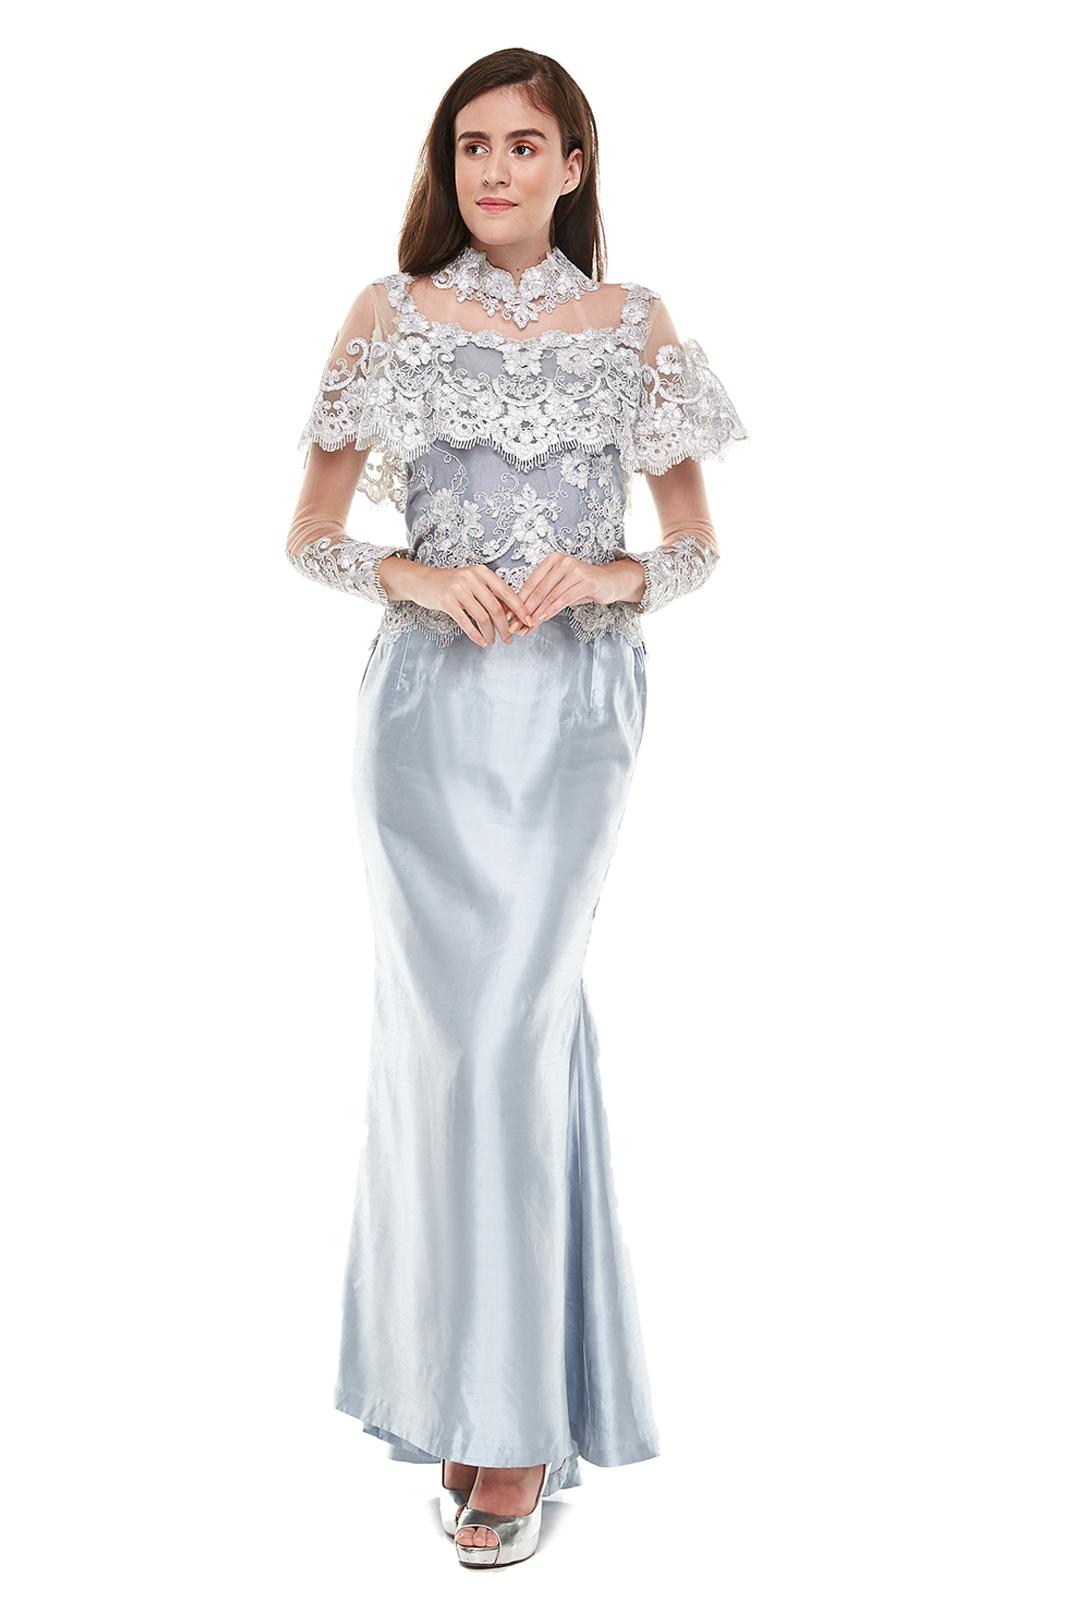 vita grey dress